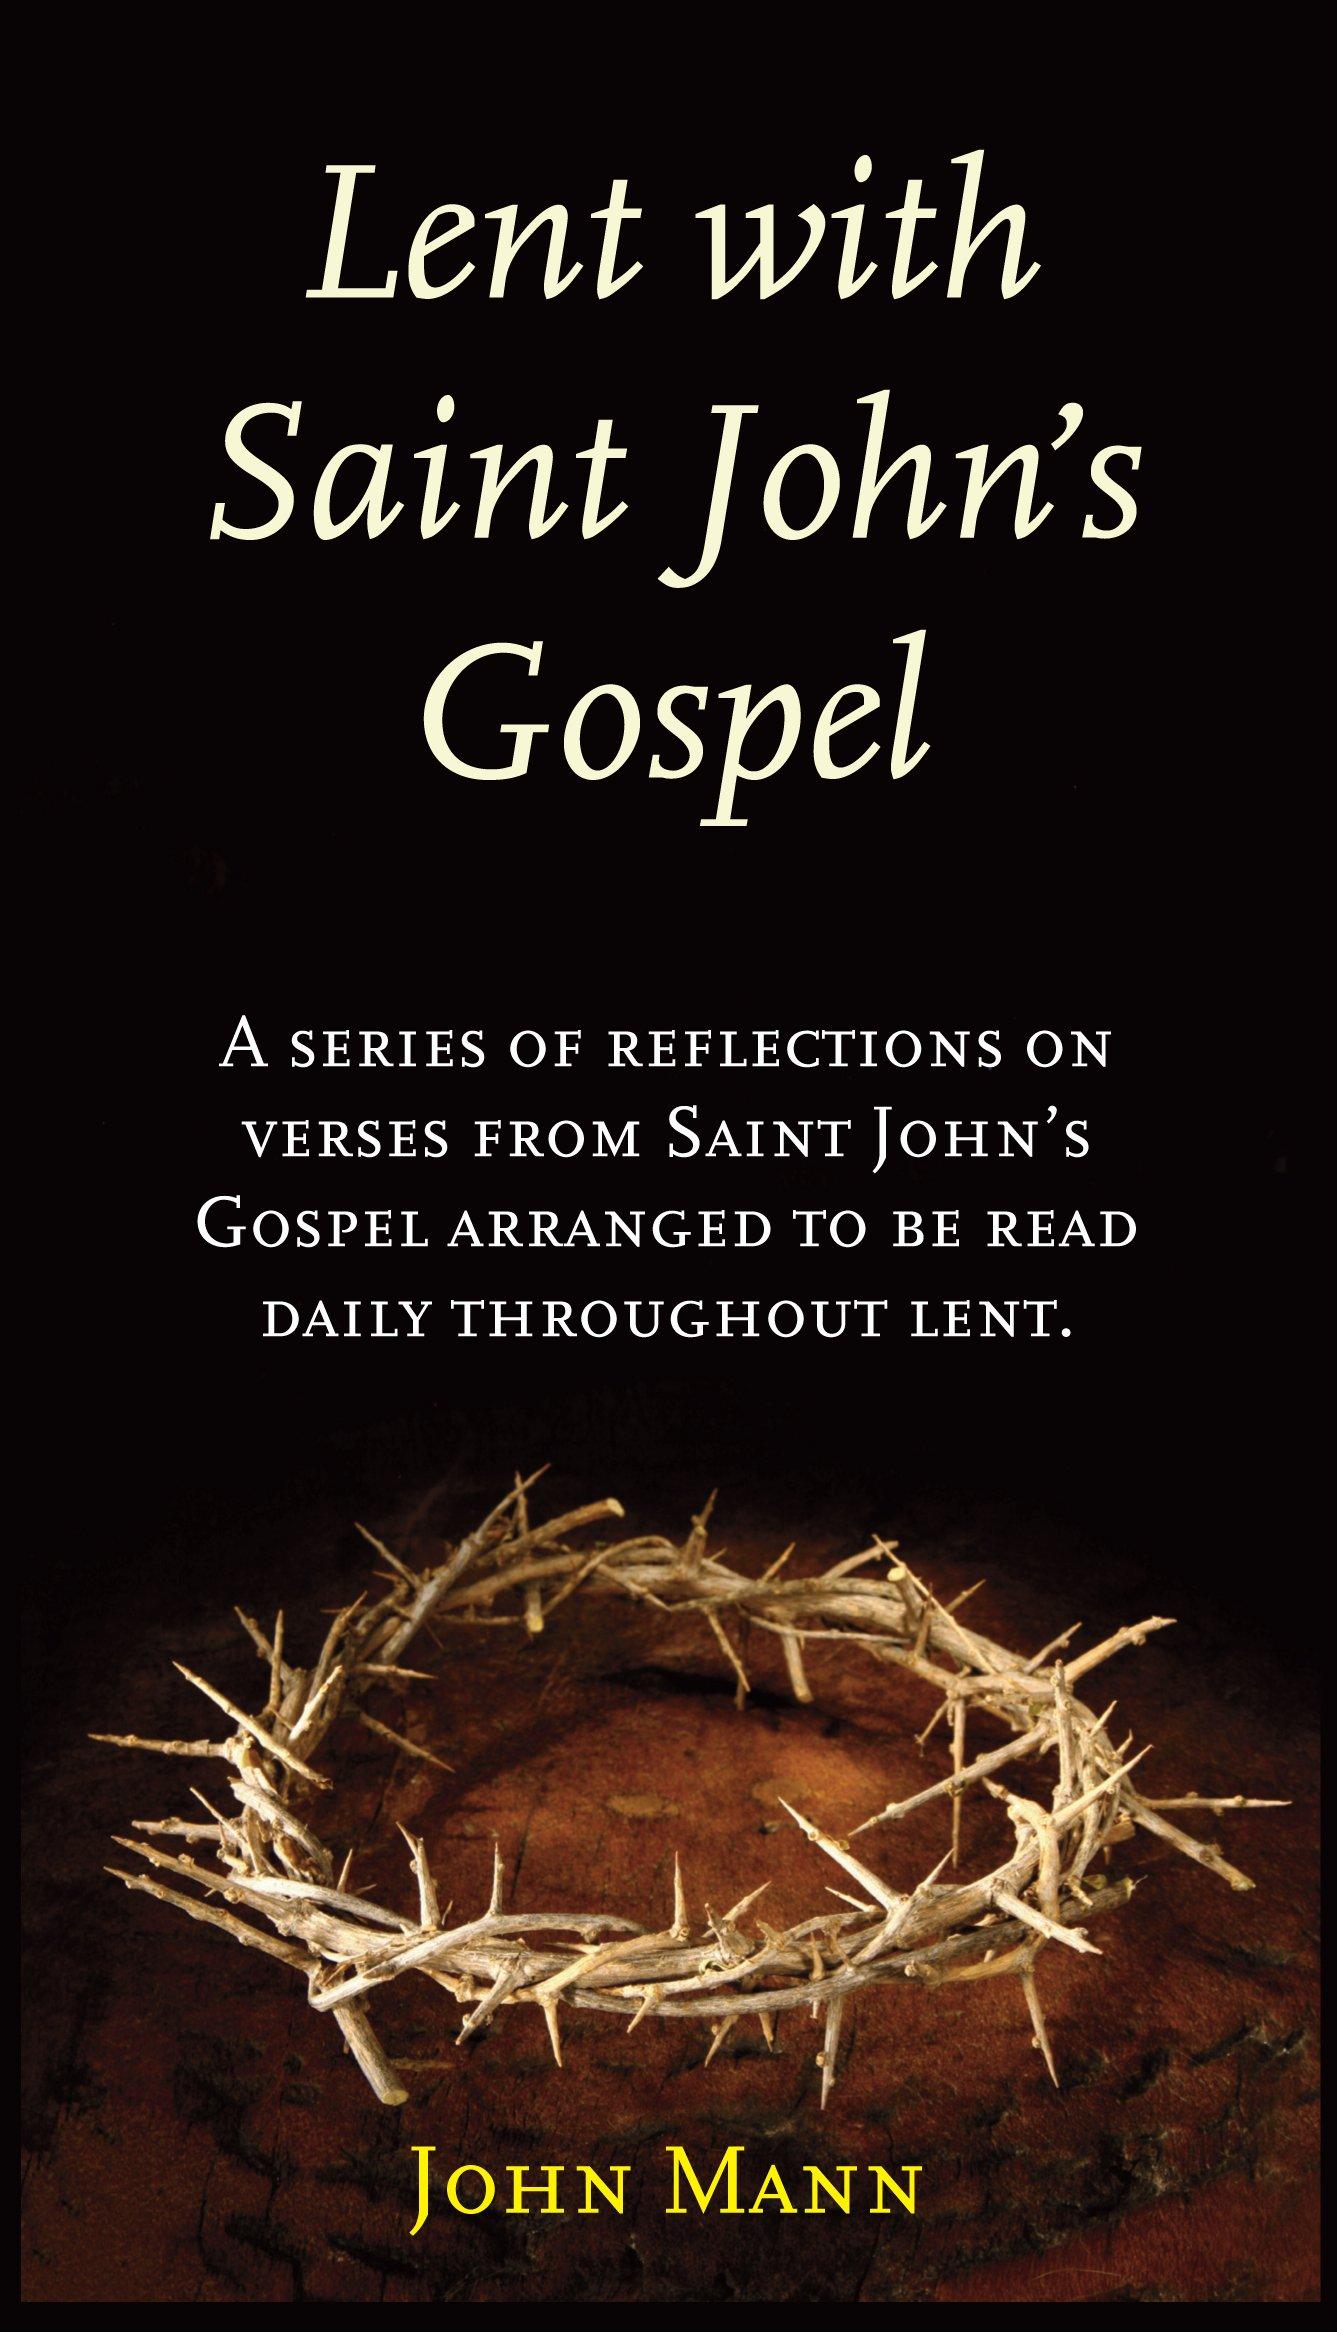 Lent With Saint John's Gospel: A Series of Reflections on Verses from Saint John's Gospel